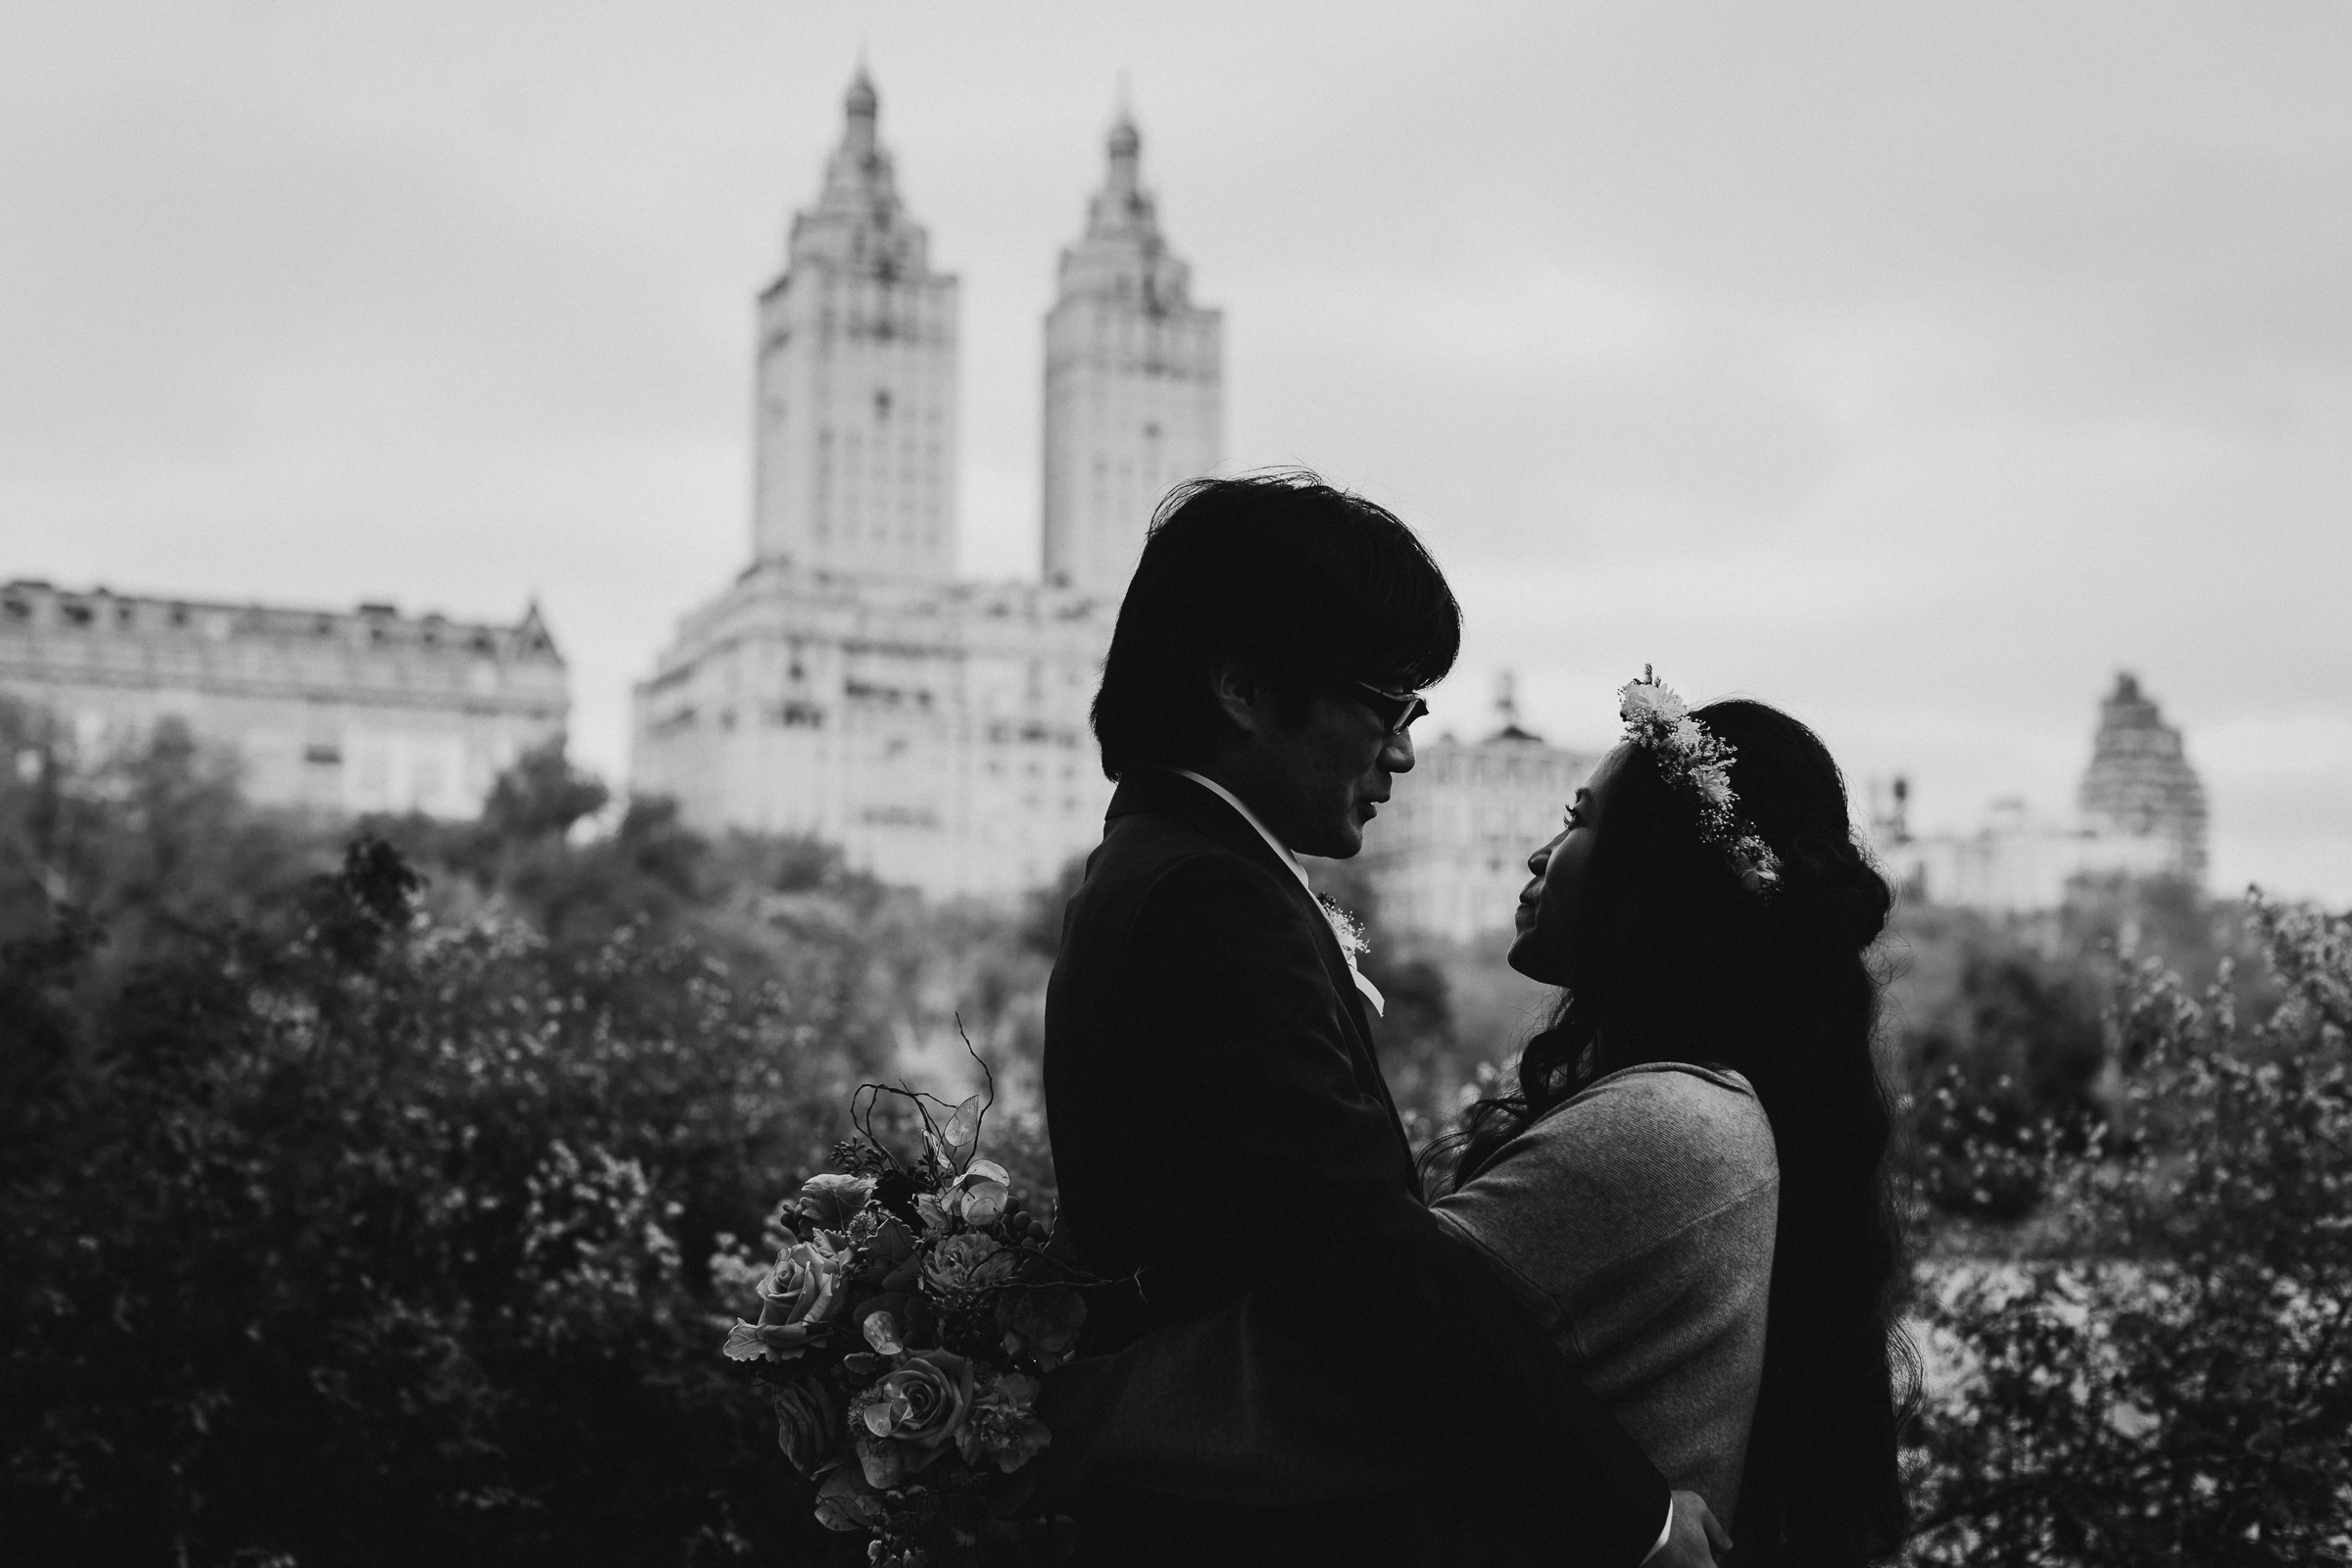 Central-Park-Brooklyn-Bridge-Dumbo-NYC-Documentary-Wedding-Photographer-36.jpg